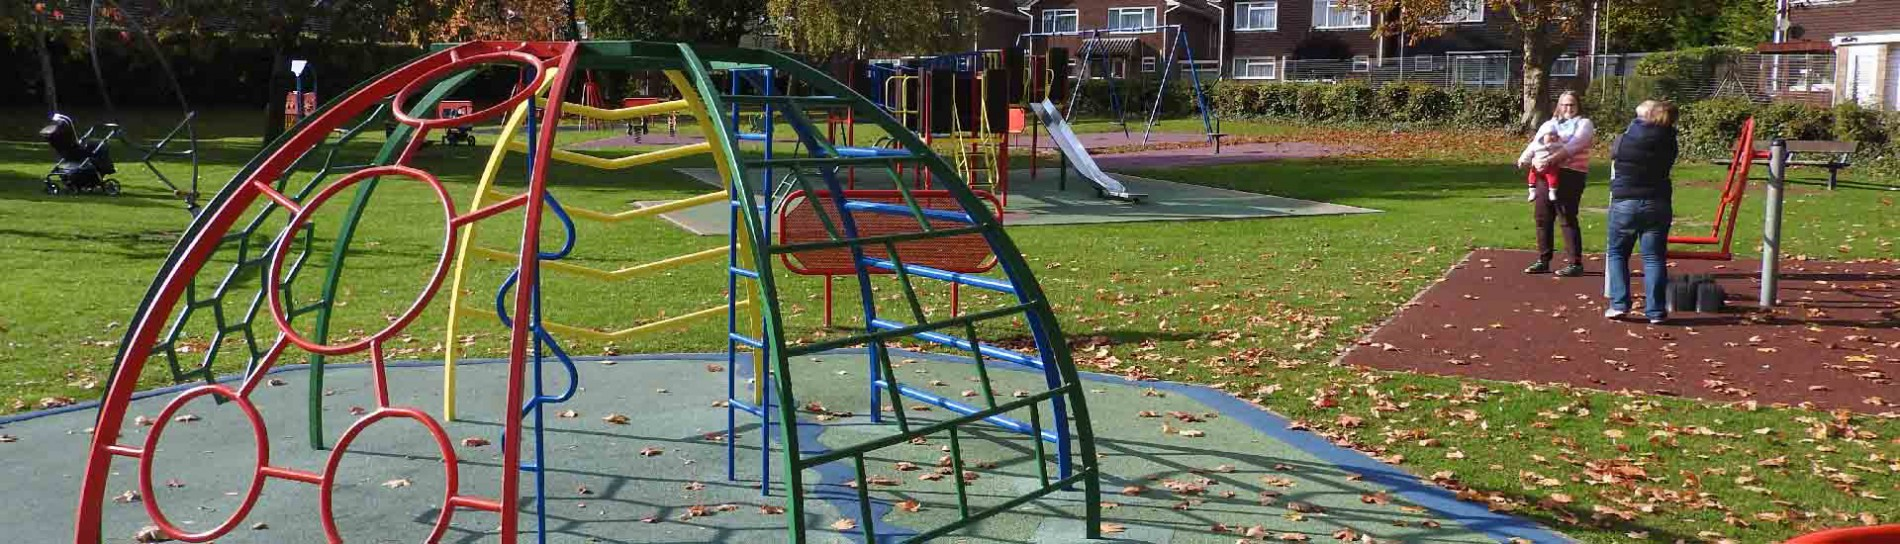 Harestock Park